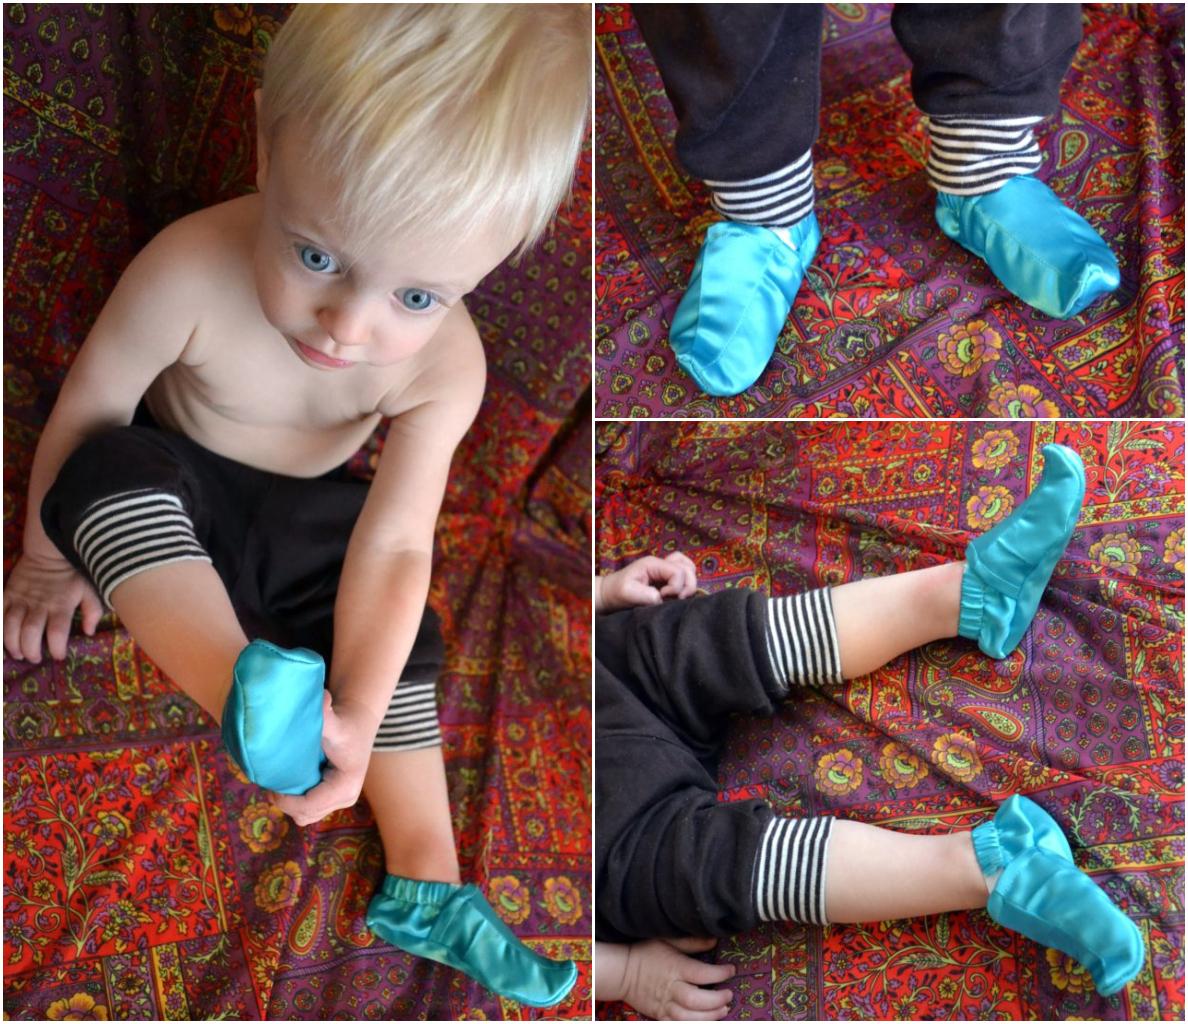 FREE PATTERN Genie Or Jasmine Baby Shoes  sc 1 st  Heather Handmade & FREE PATTERN: Genie Or Jasmine Baby Shoes - Heather Handmade